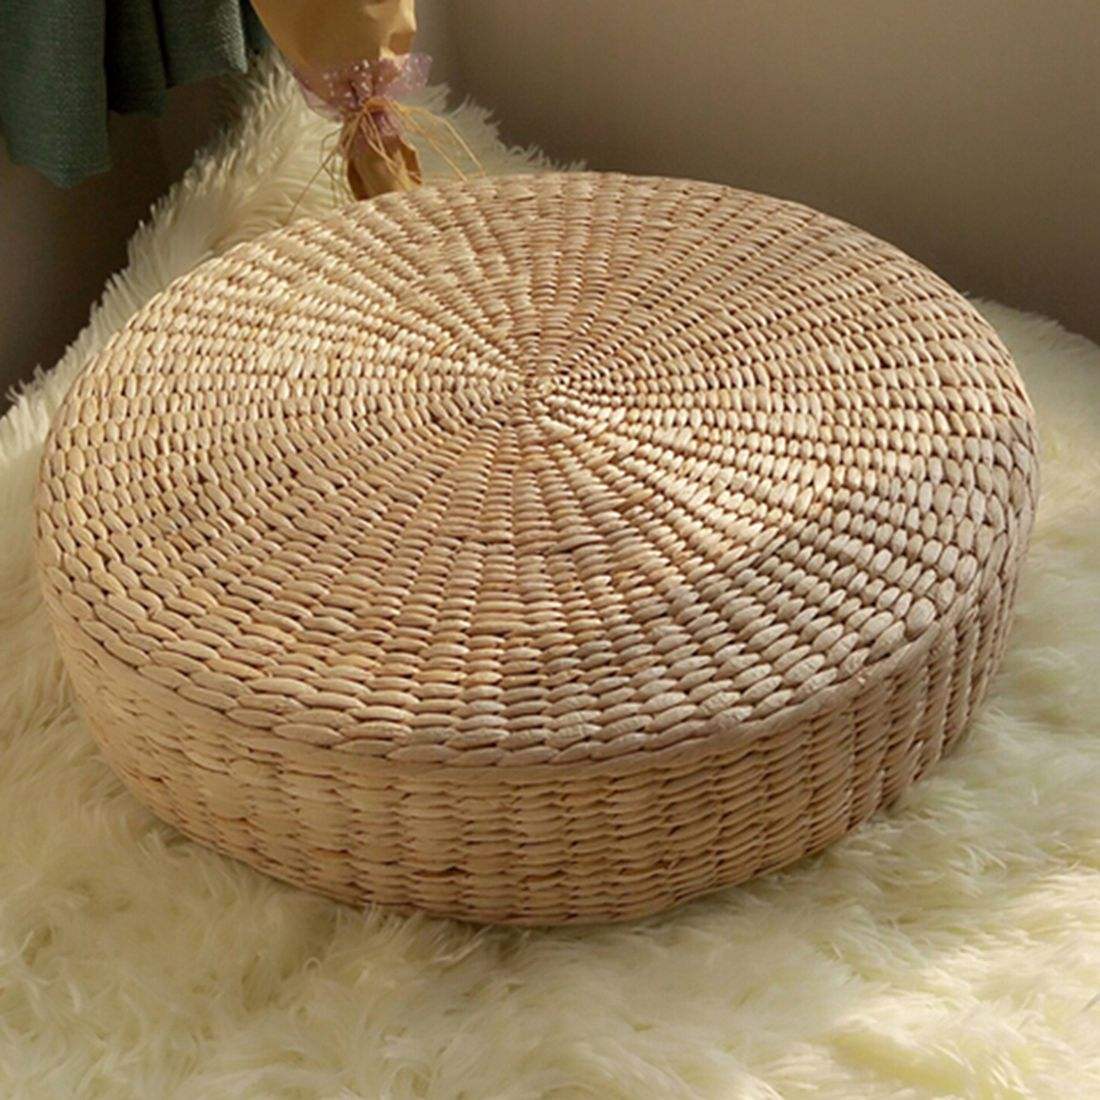 HOT SALE 40cm Tatami Cushion Round Straw Weave Handmade Pillow Floor Yoga Chair Seat Mat HOT SALE 40cm Tatami Cushion Round Straw Weave Handmade Pillow Floor Yoga Chair Seat Mat